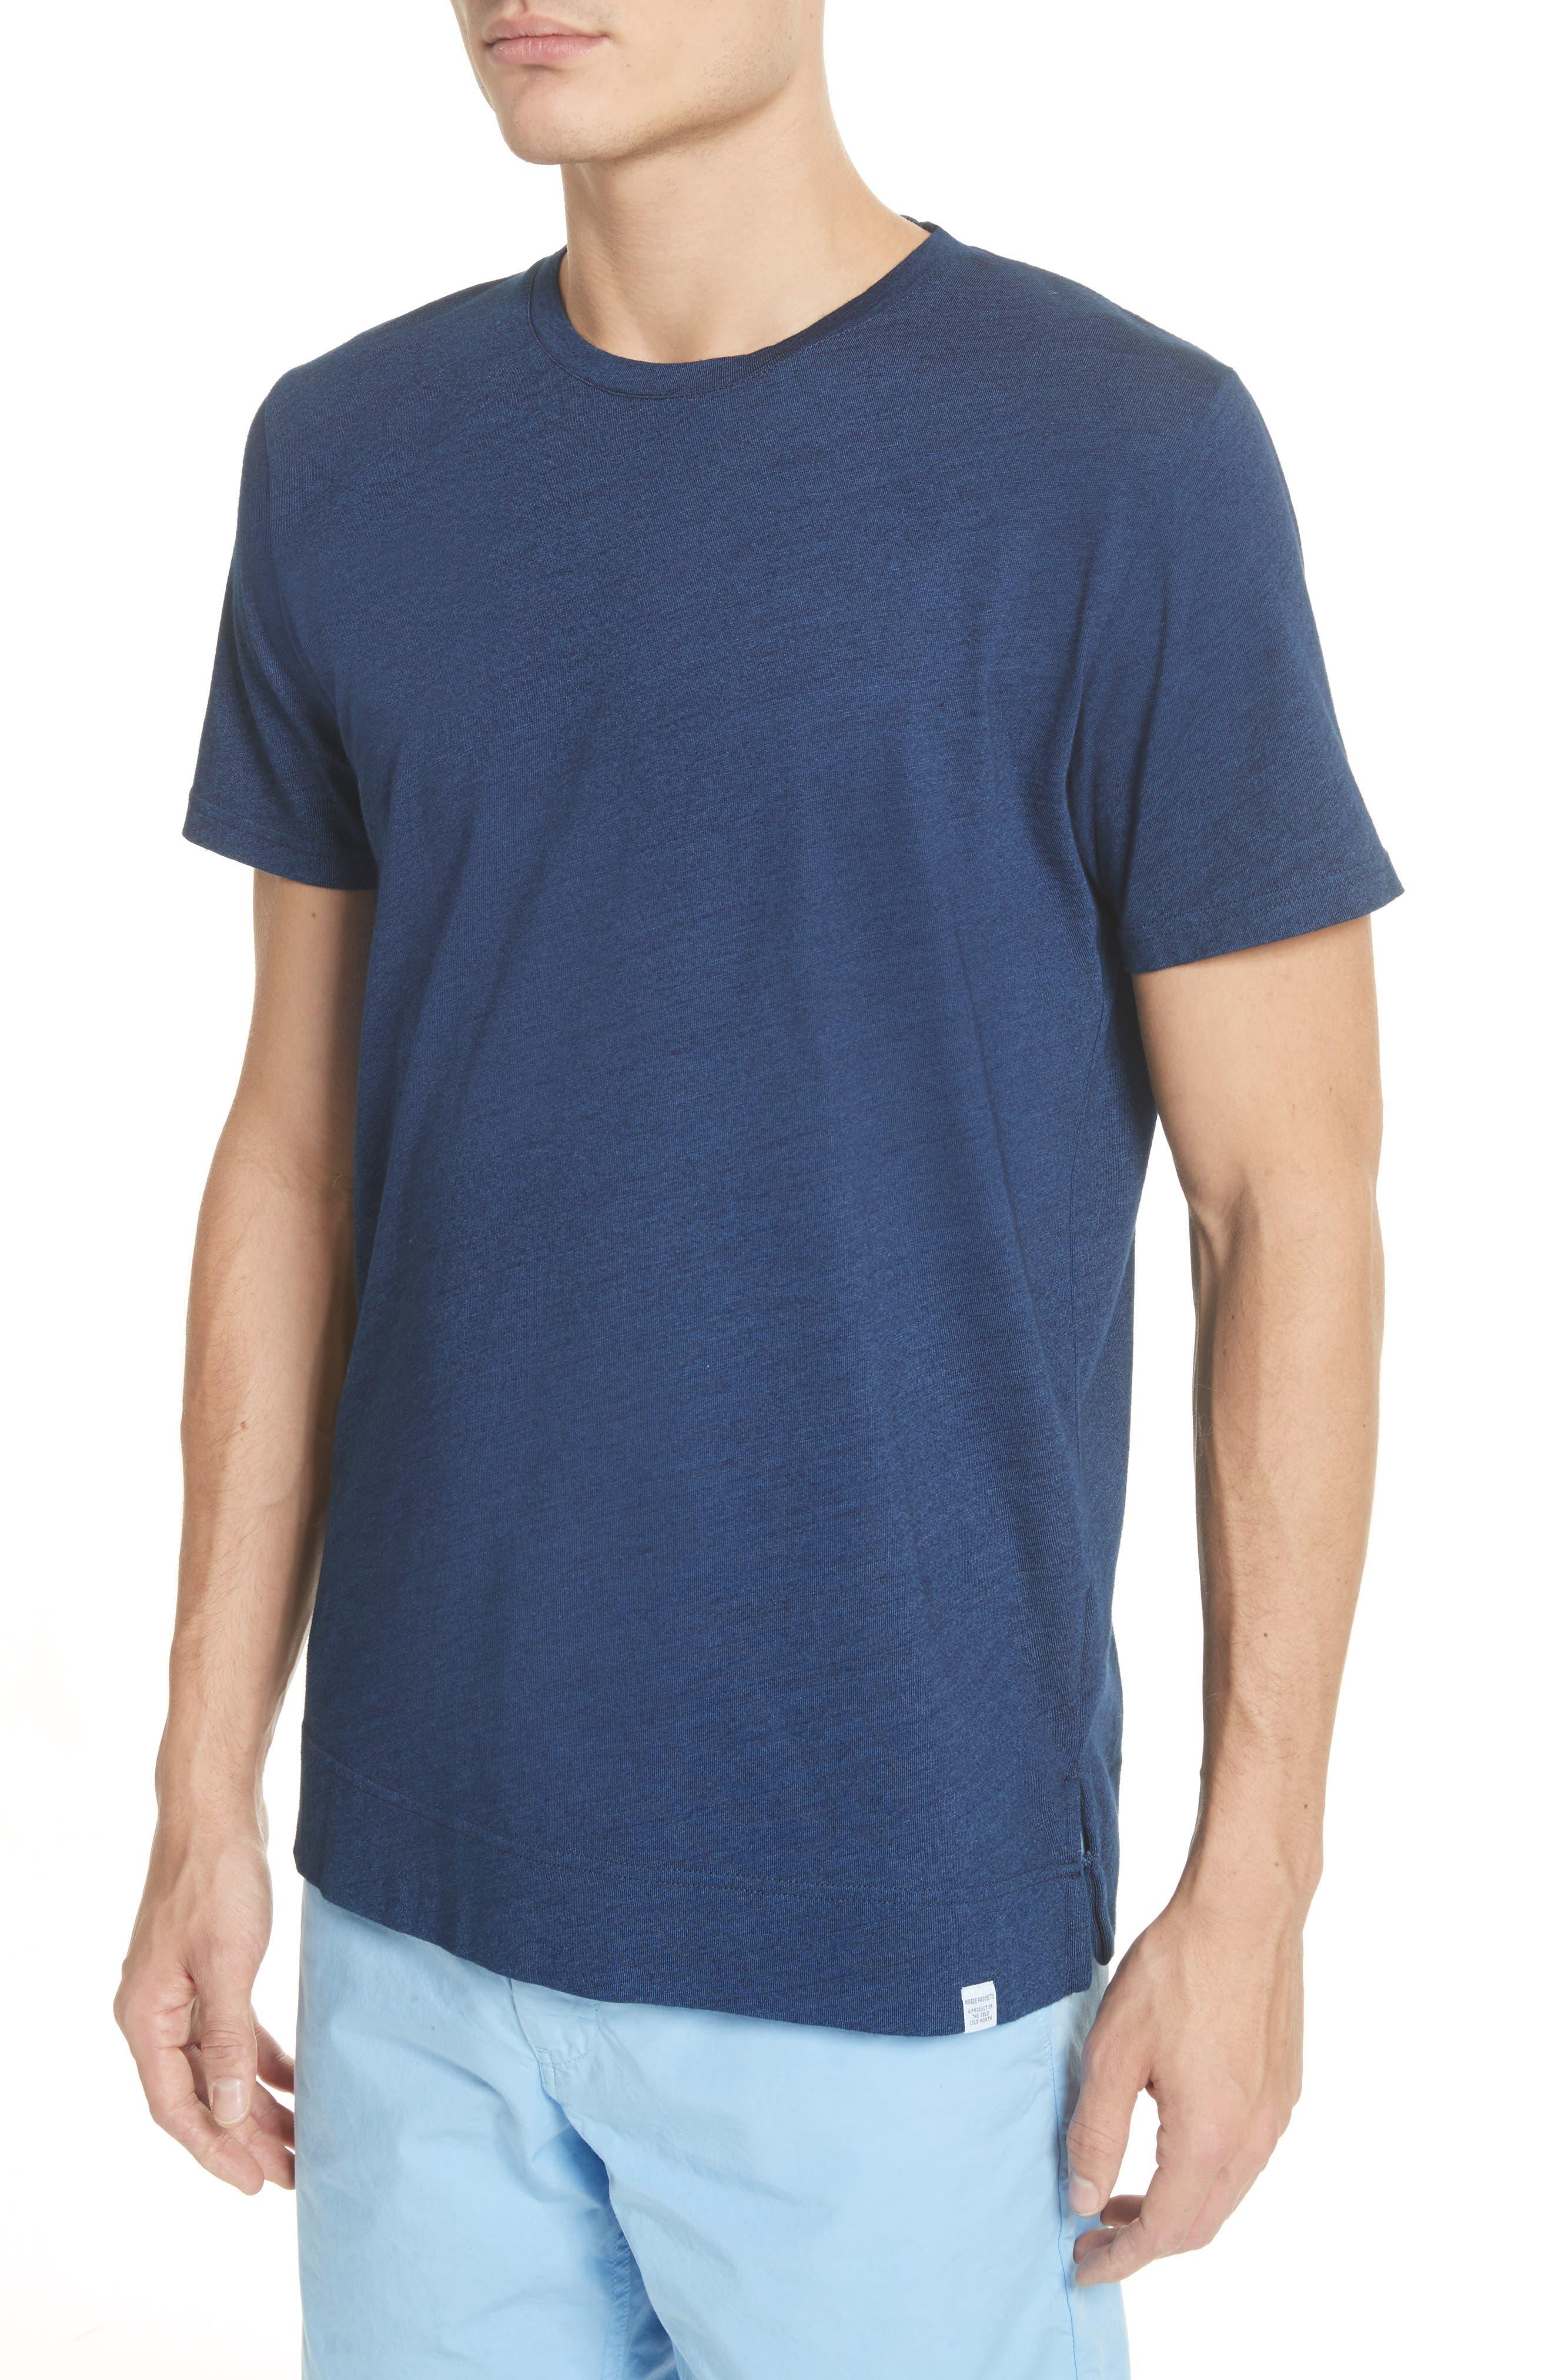 Niels Indigo T-Shirt,                             Alternate thumbnail 3, color,                             Indigo